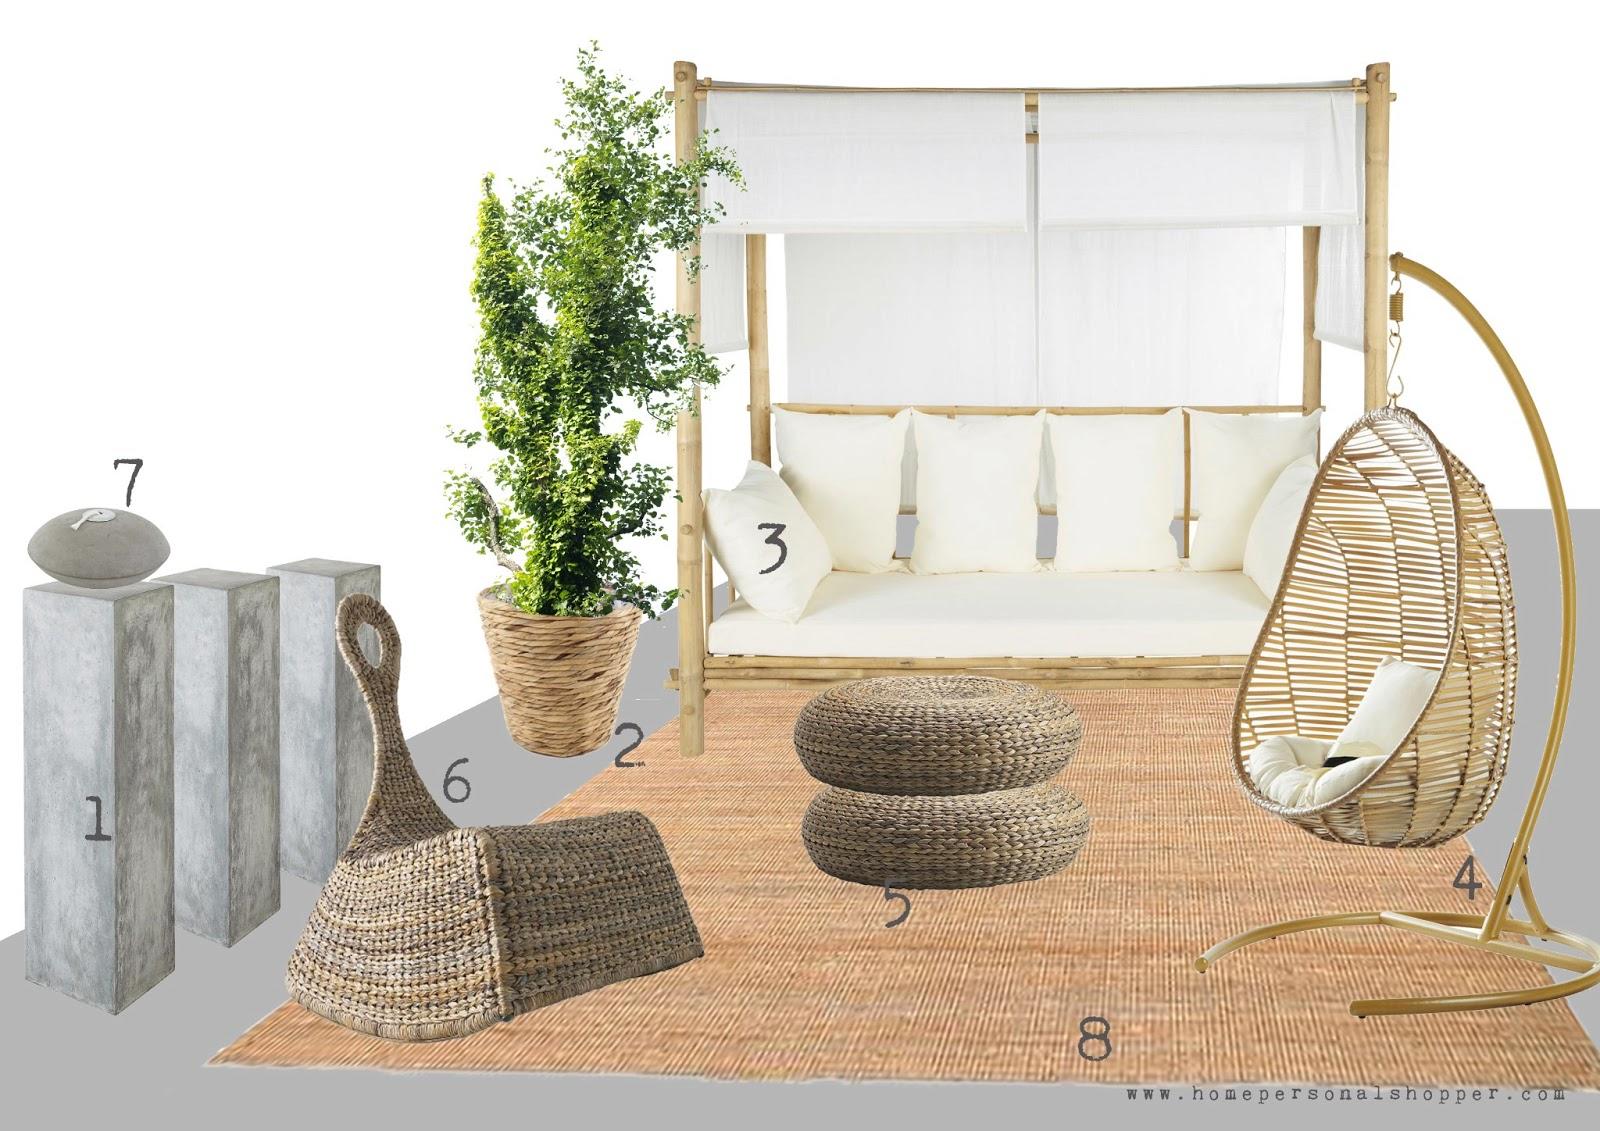 Terrazas homepersonalshopper. zara home, ikea, masion du monde, habitat, donde comprar , madera, blanco, natural, colores